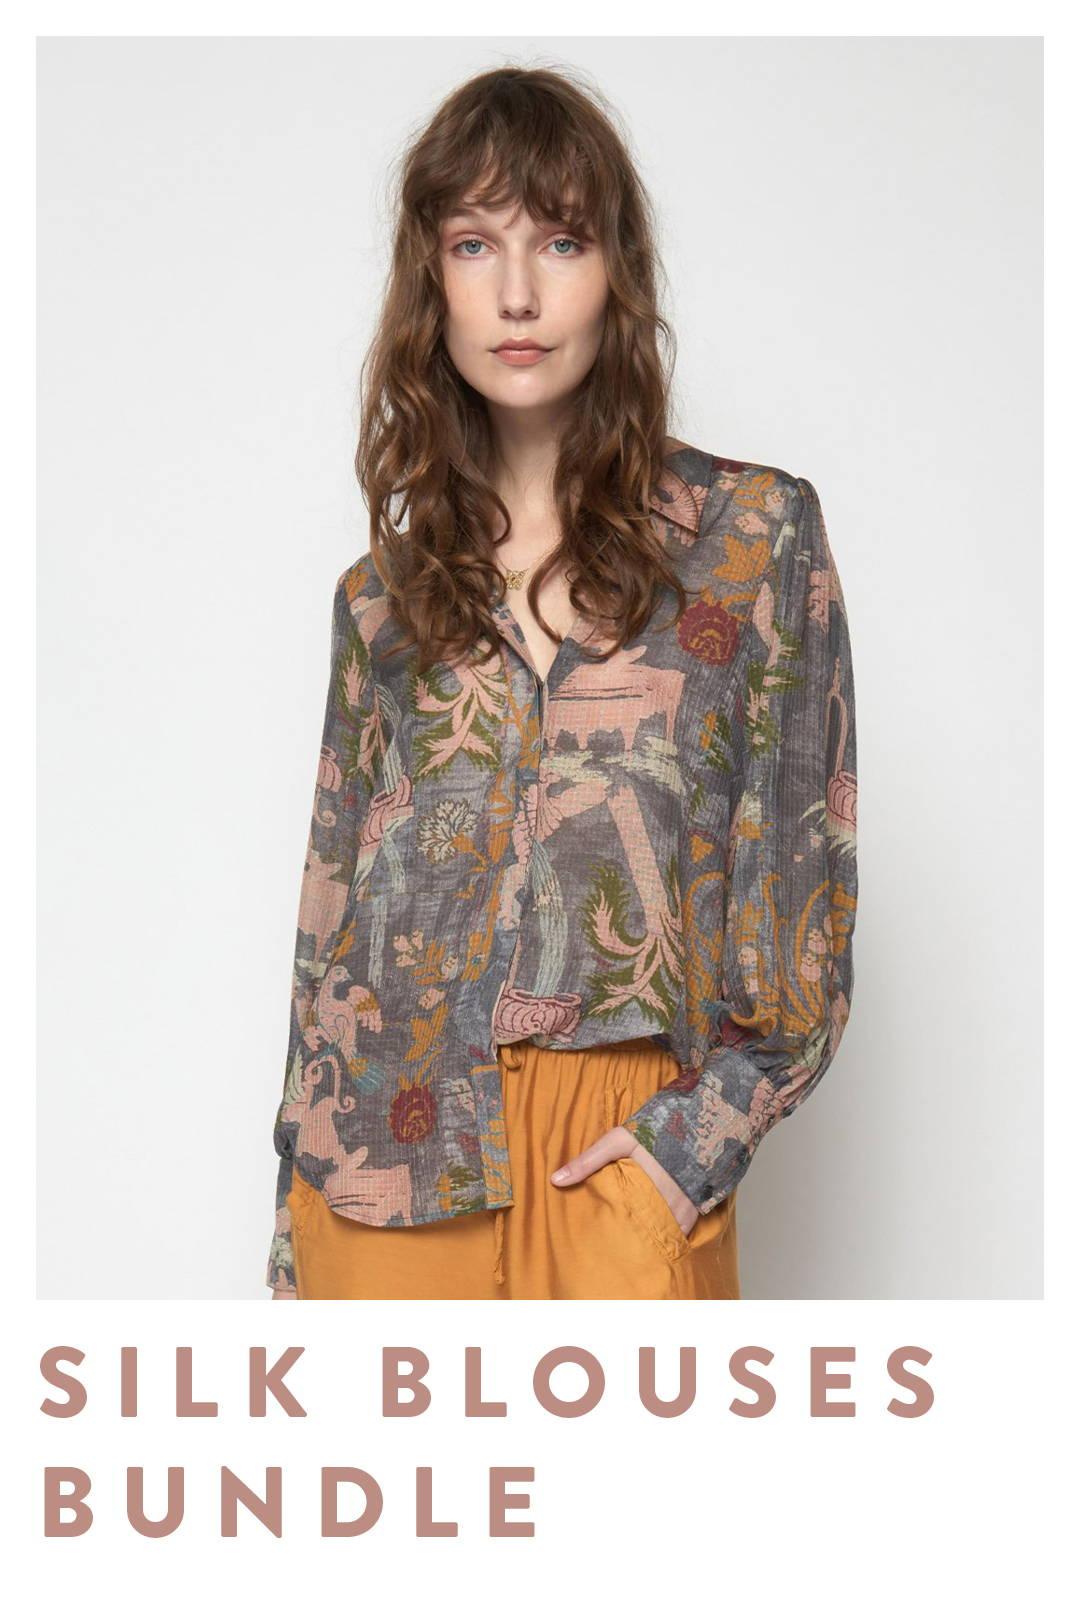 silk blouses bundle